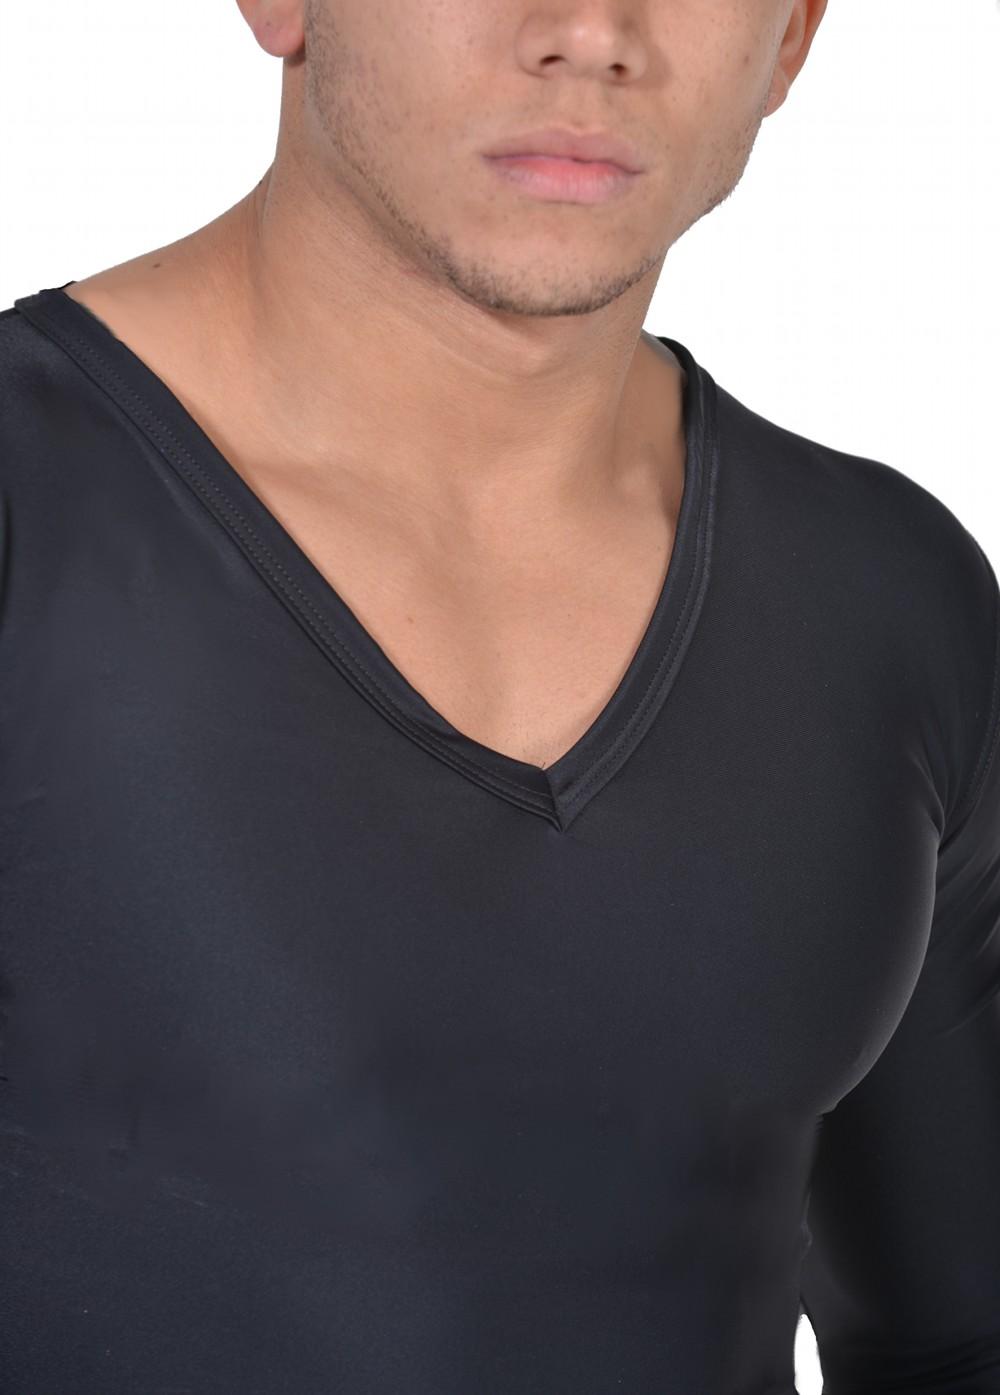 Men's Slimming Undershirt Body Shaper Arm control Shapewear Long Sleeve zoom in